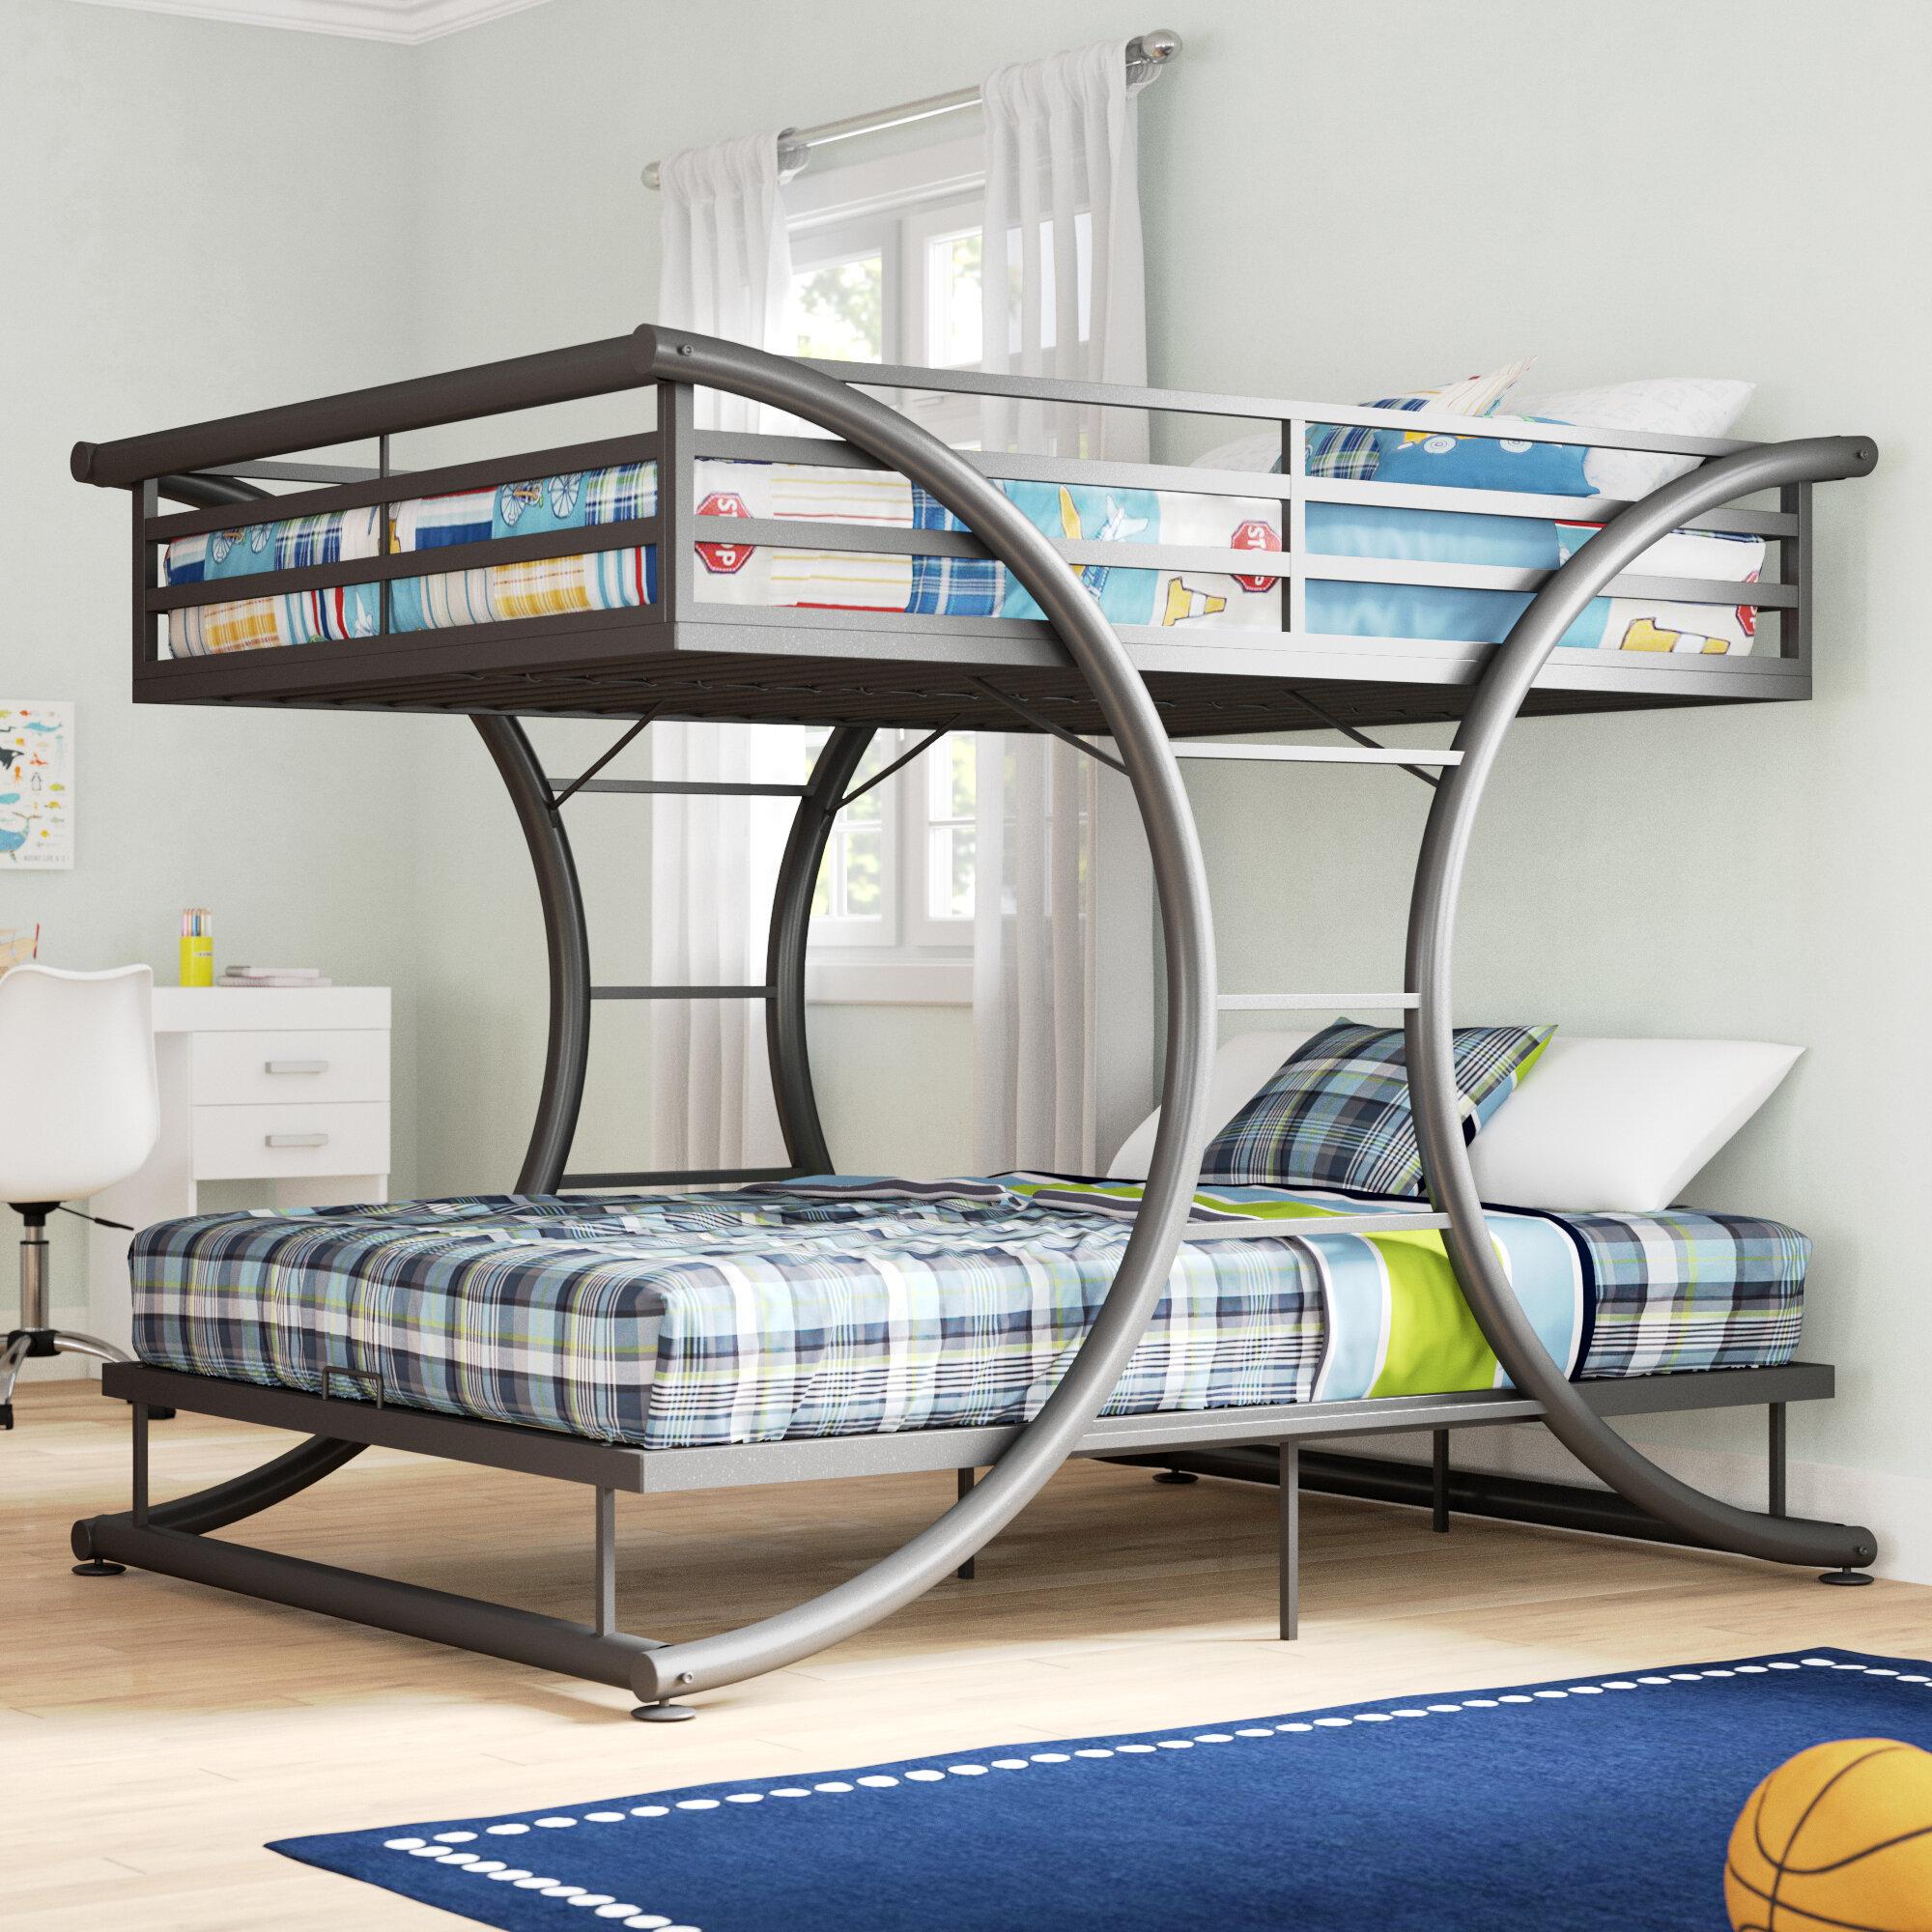 detail bunkbed f bed over furniture kids bedroom full beds mecca bunk fbb